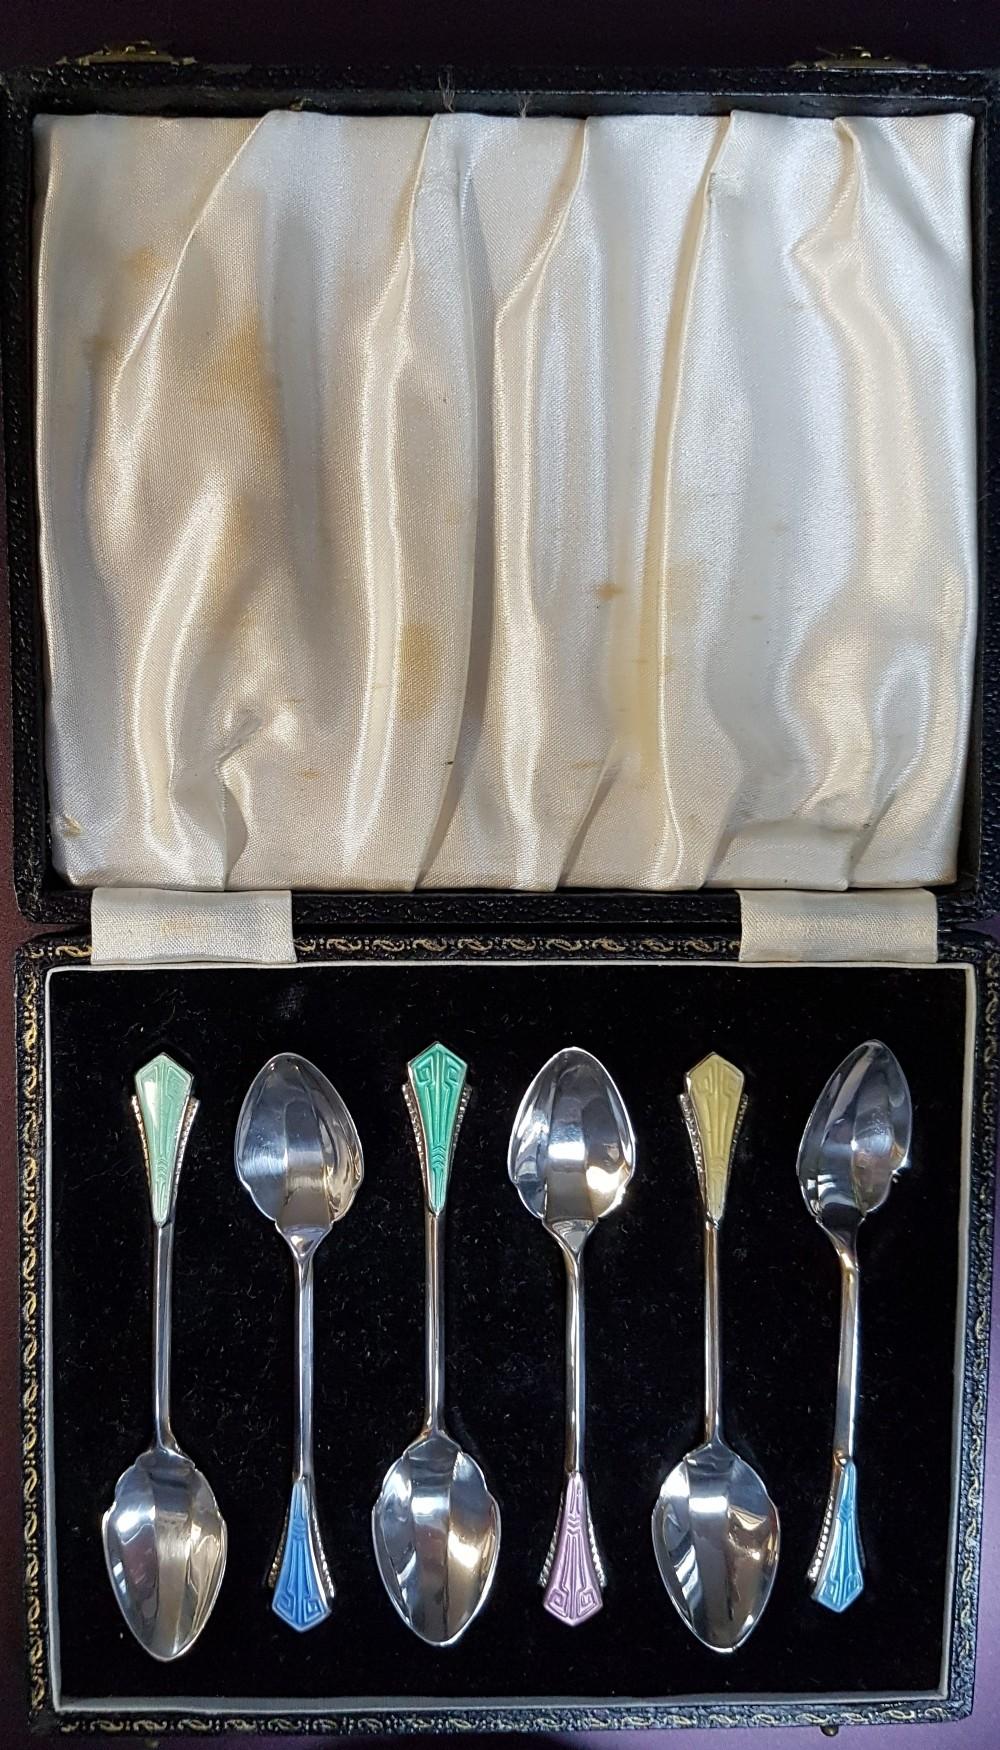 boxed set of 6 silver enamel teaspoons